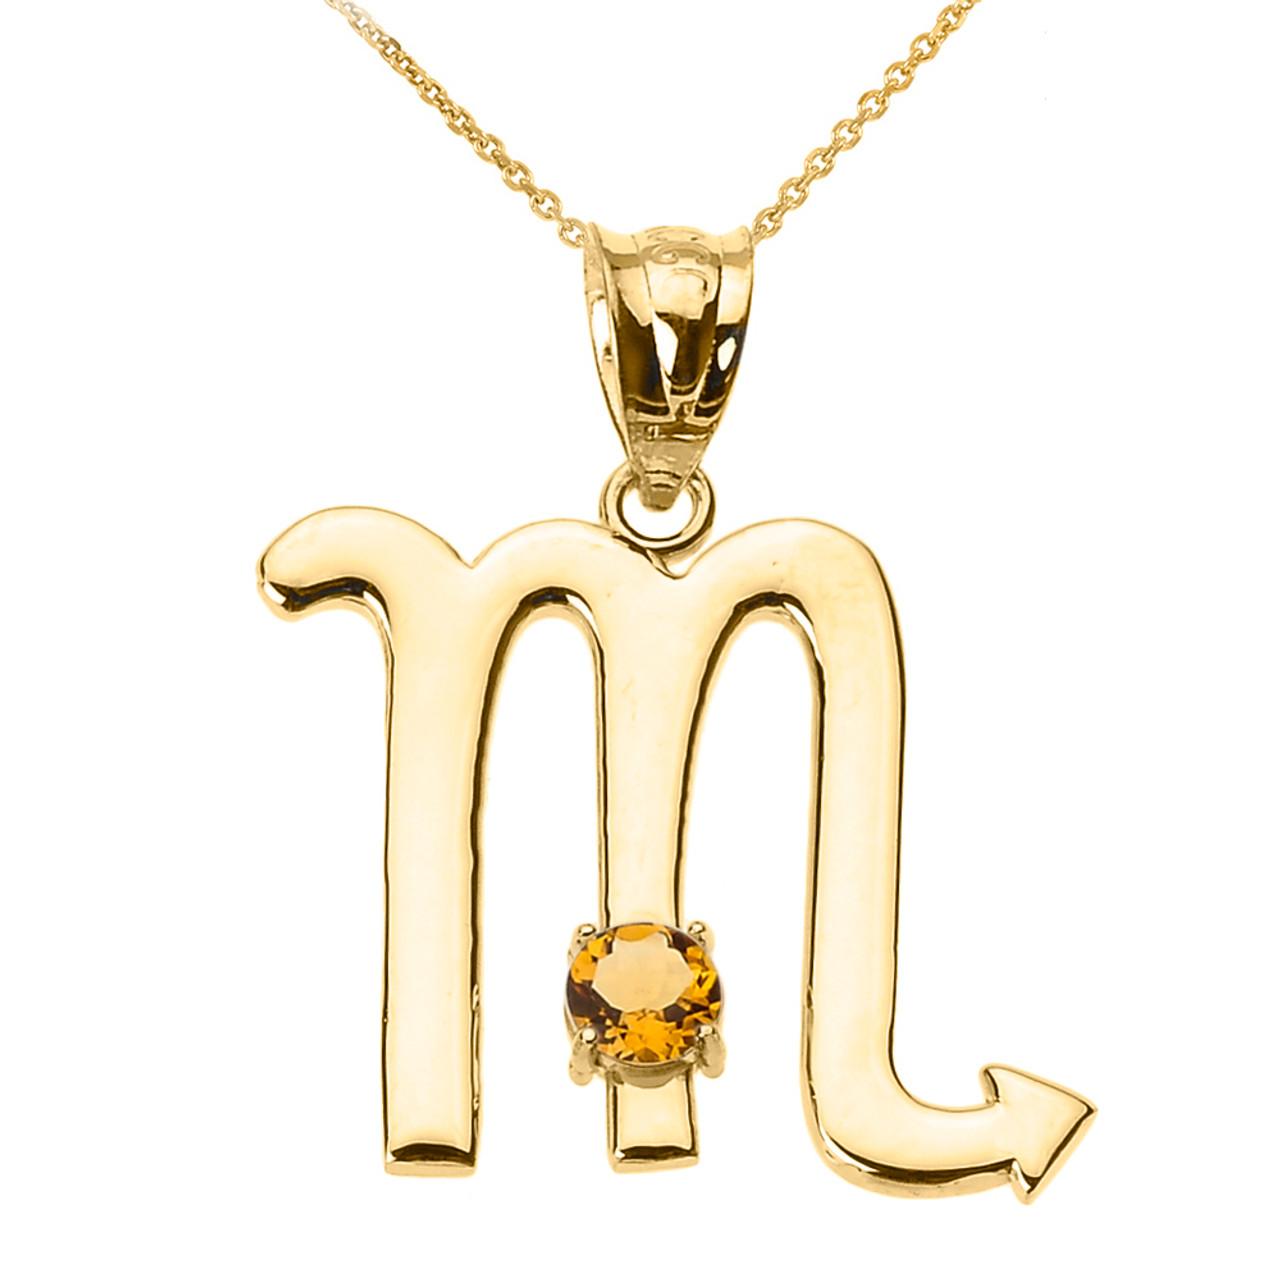 yellow gold scorpio zodiac sign november birthstone pendant necklace. Black Bedroom Furniture Sets. Home Design Ideas